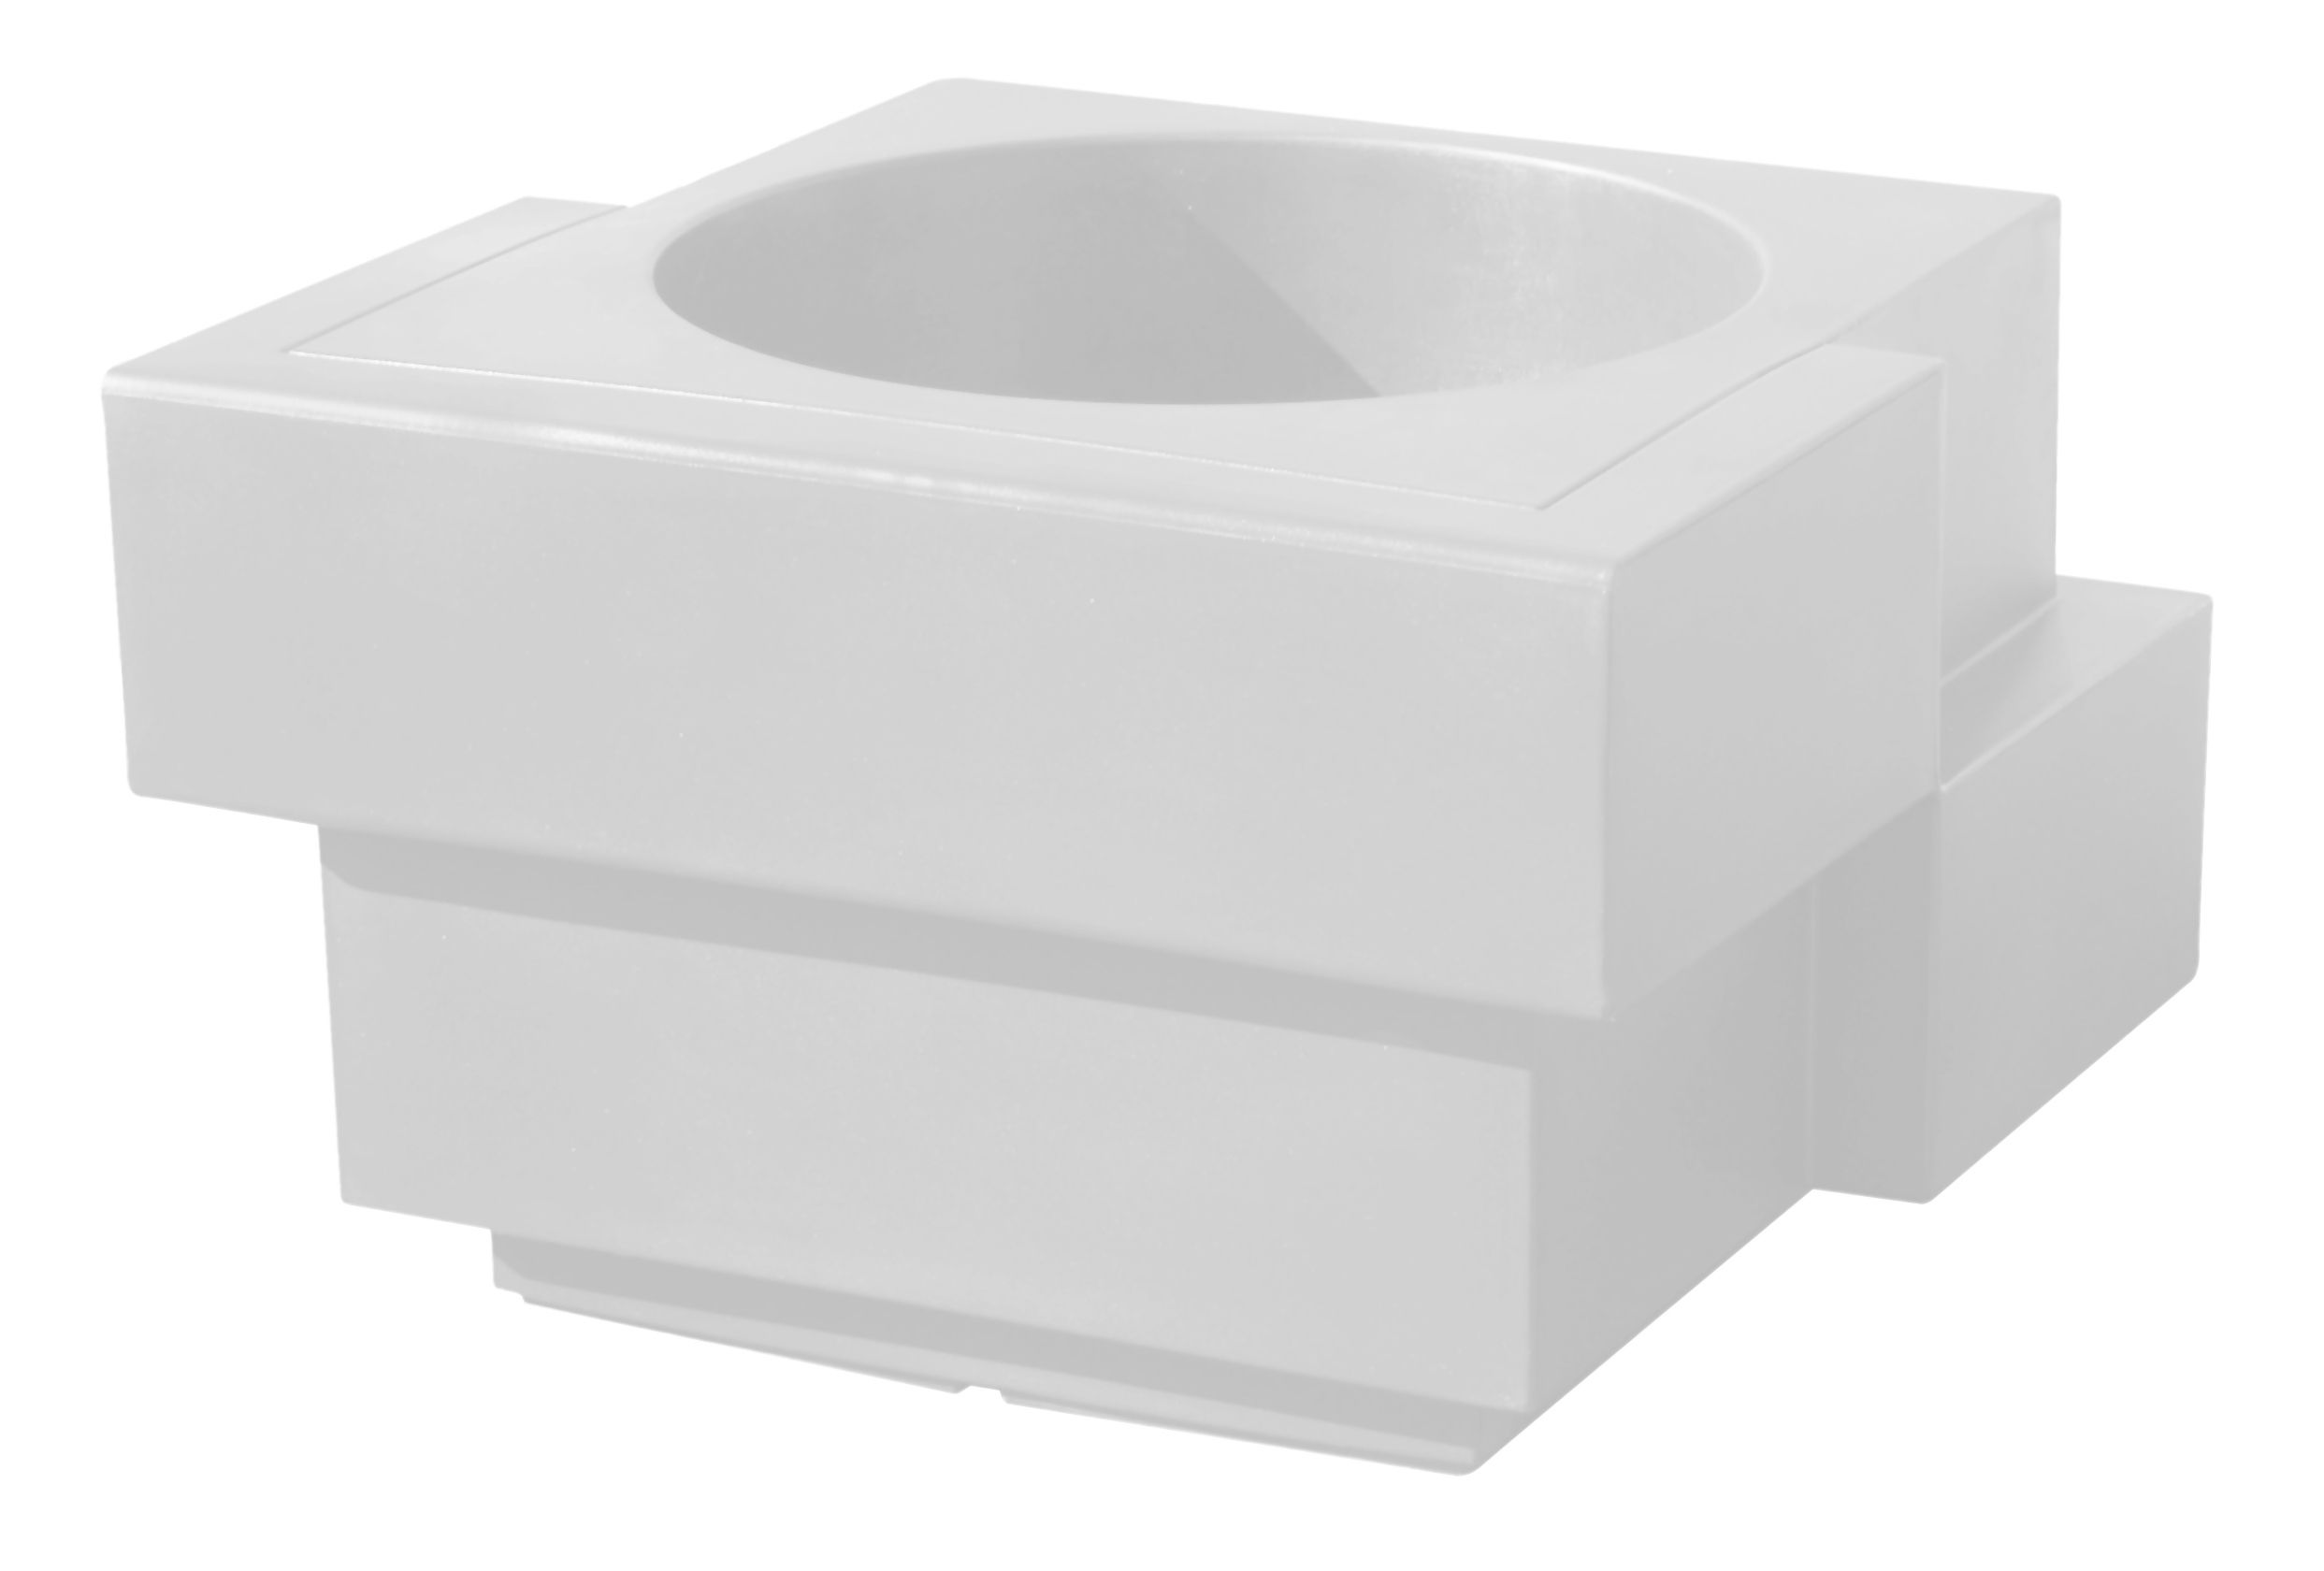 Möbel - Leuchtmöbel - Cubic Yo Lumineux leuchtender Blumentopf - Slide - Weiß - polyéthène recyclable